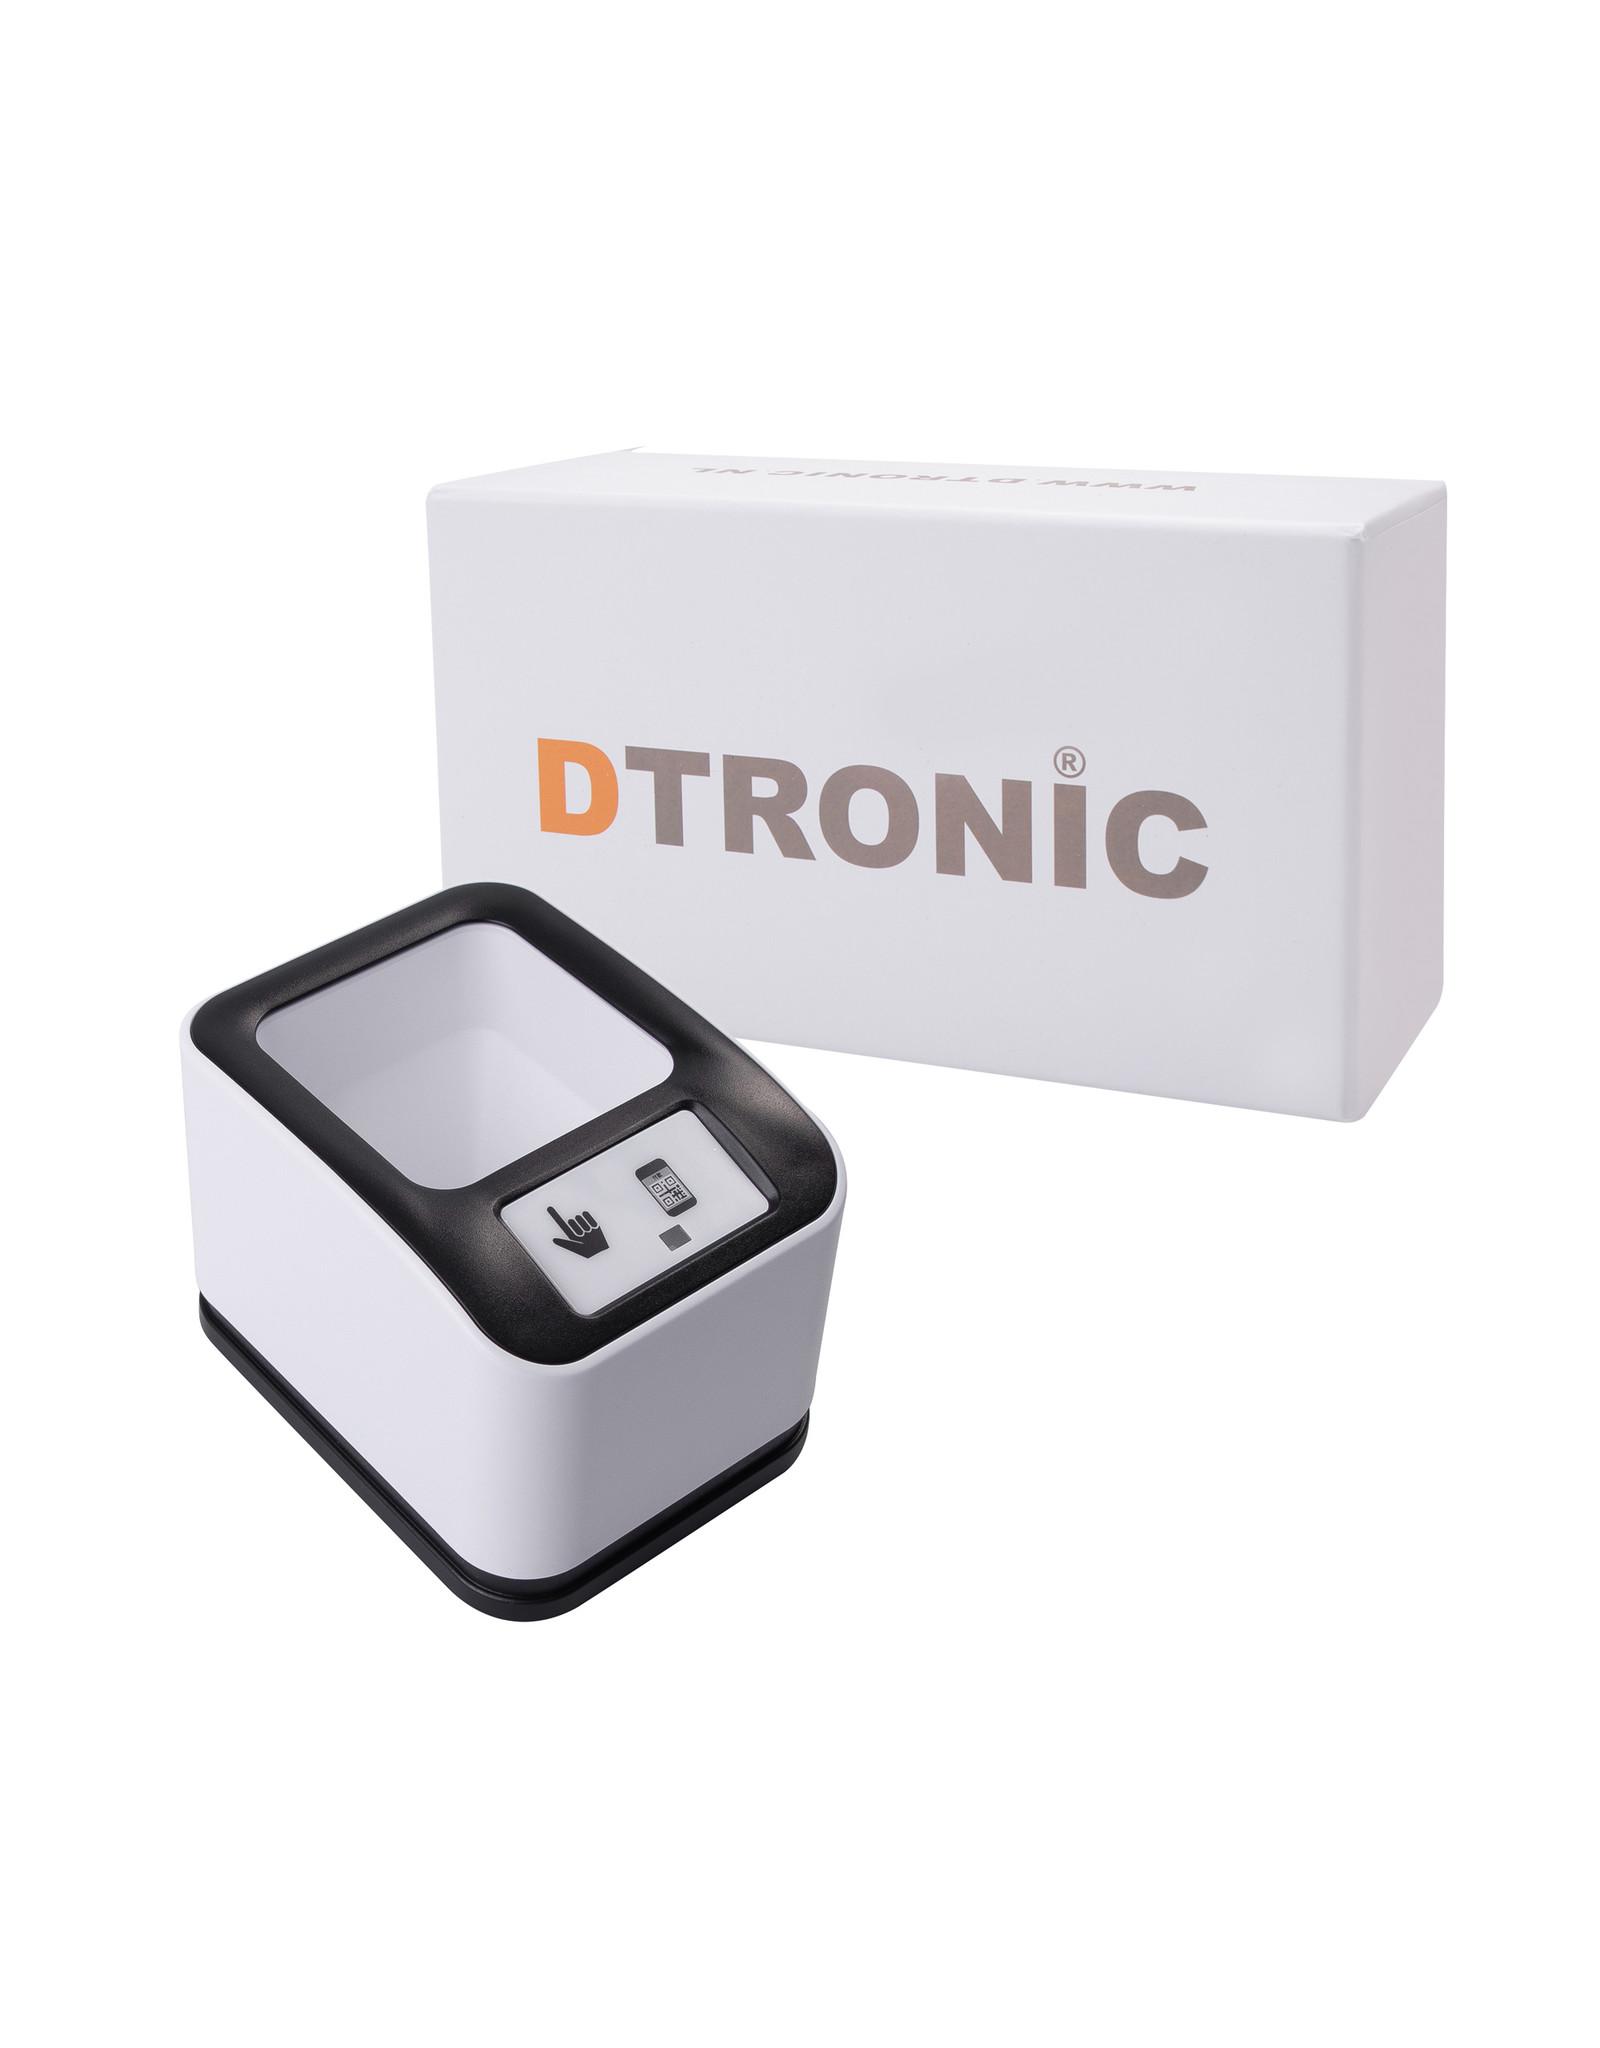 DTRONIC DTRONIC - MP2200